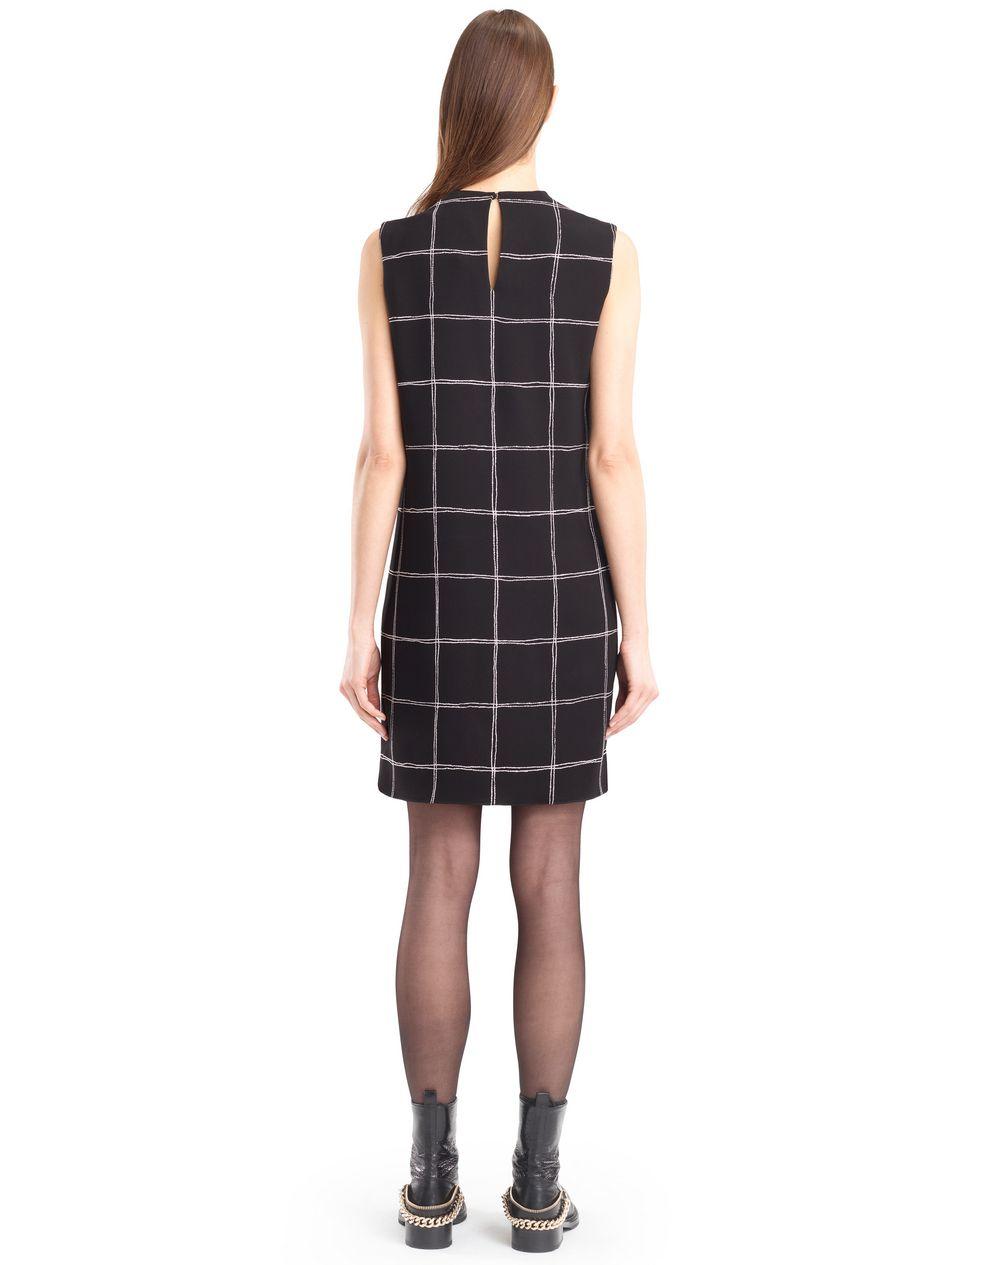 CHEQUERED CADY DRESS - Lanvin